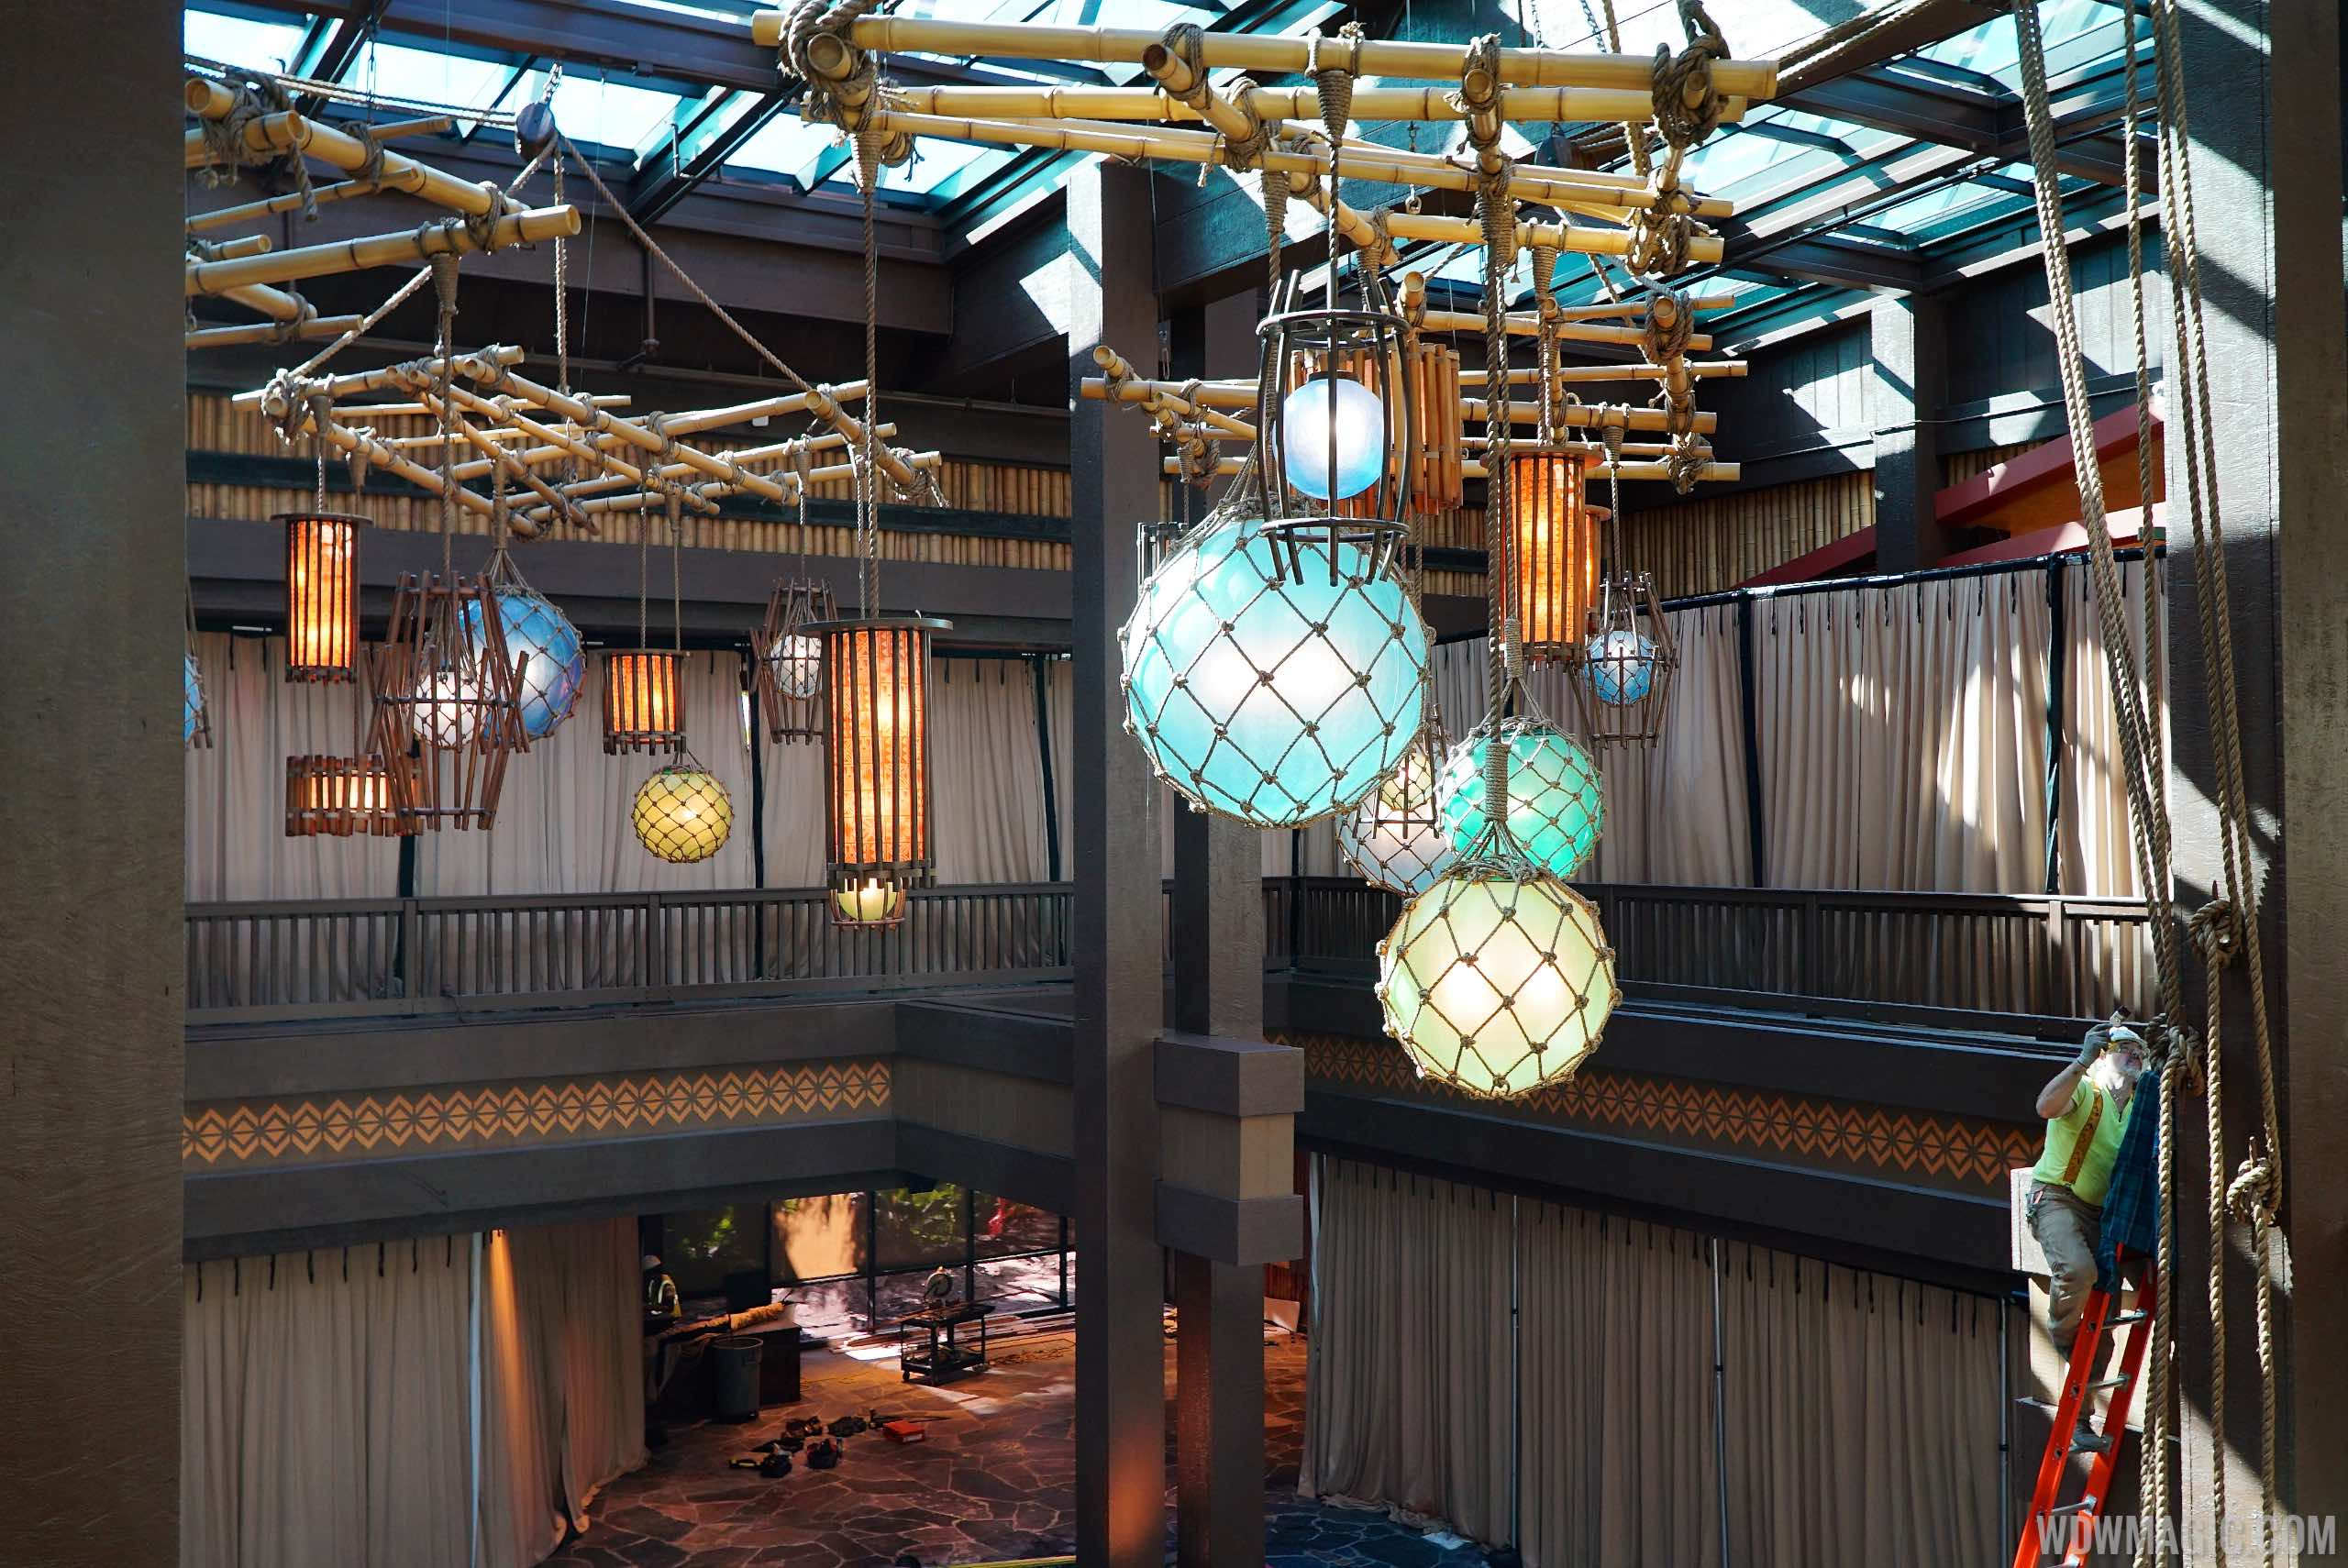 New Polynesian Lobby from above